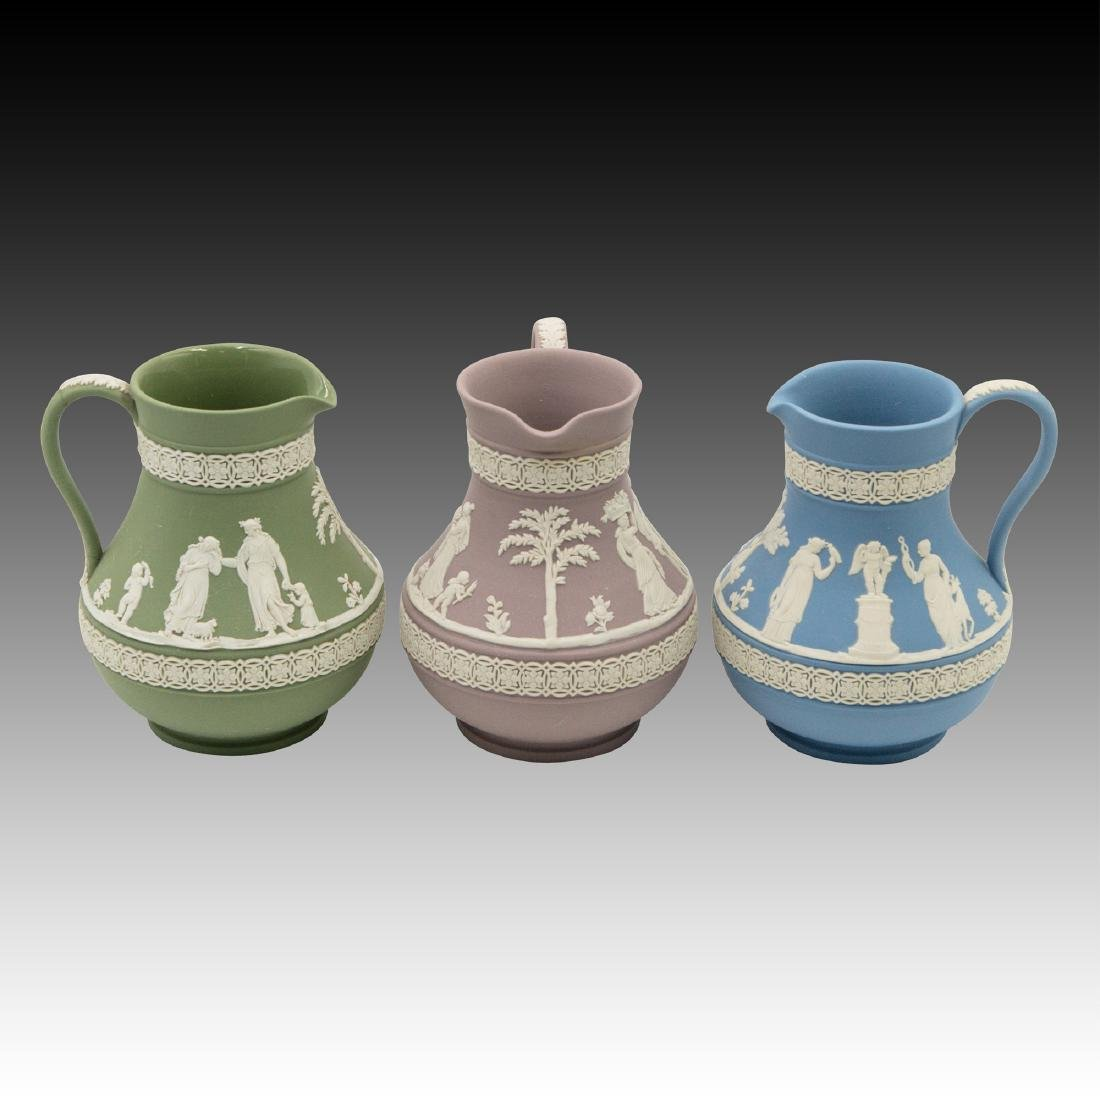 3 Vintage Wedgwood Jasperware Pitchers